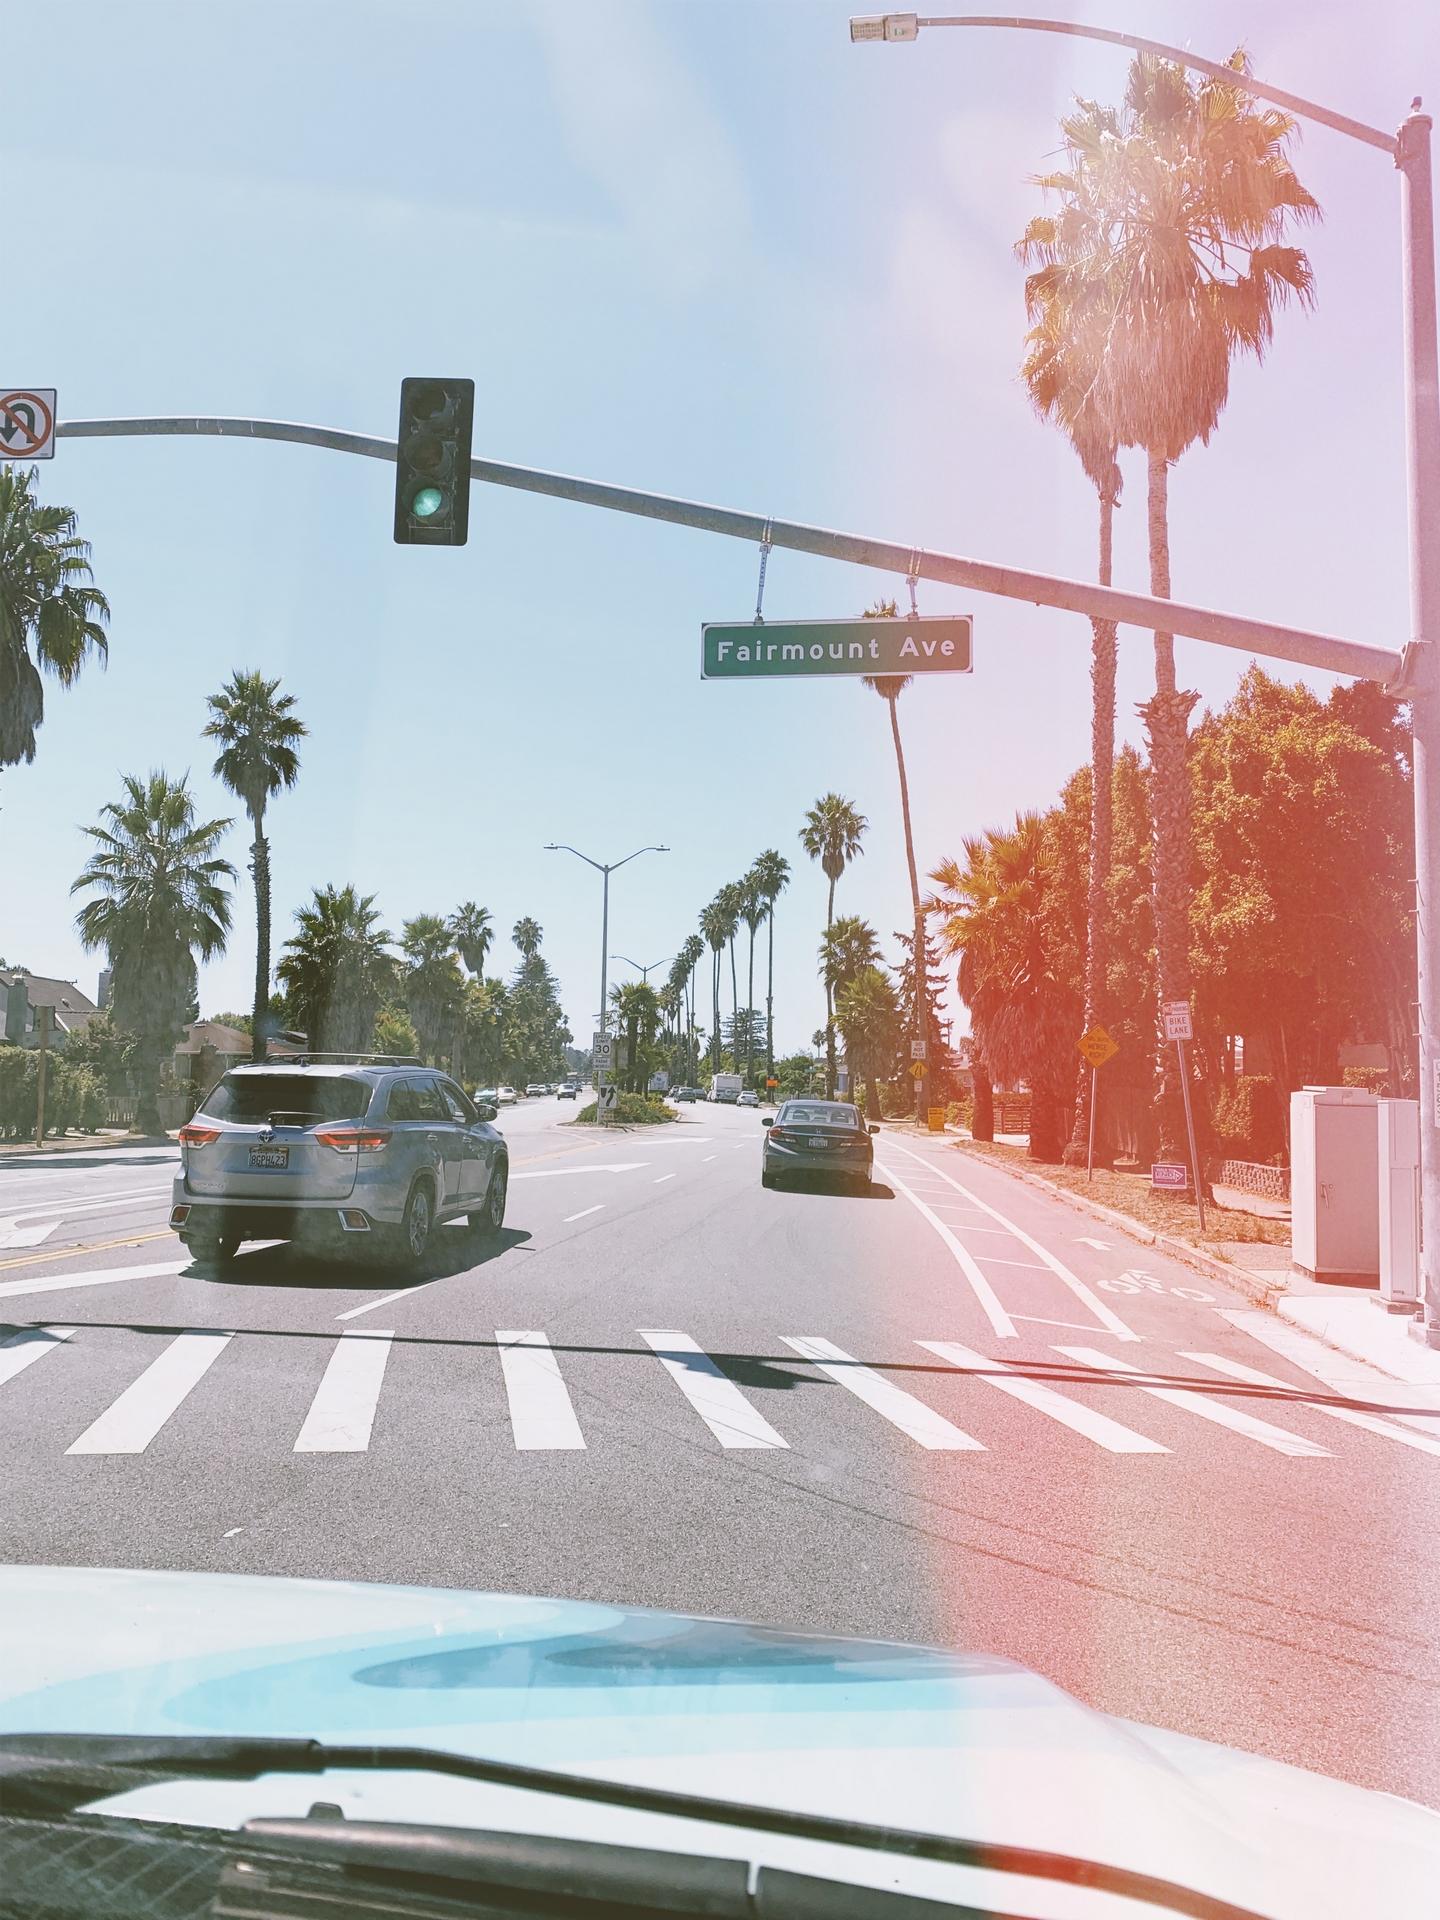 Santa Cruz streets